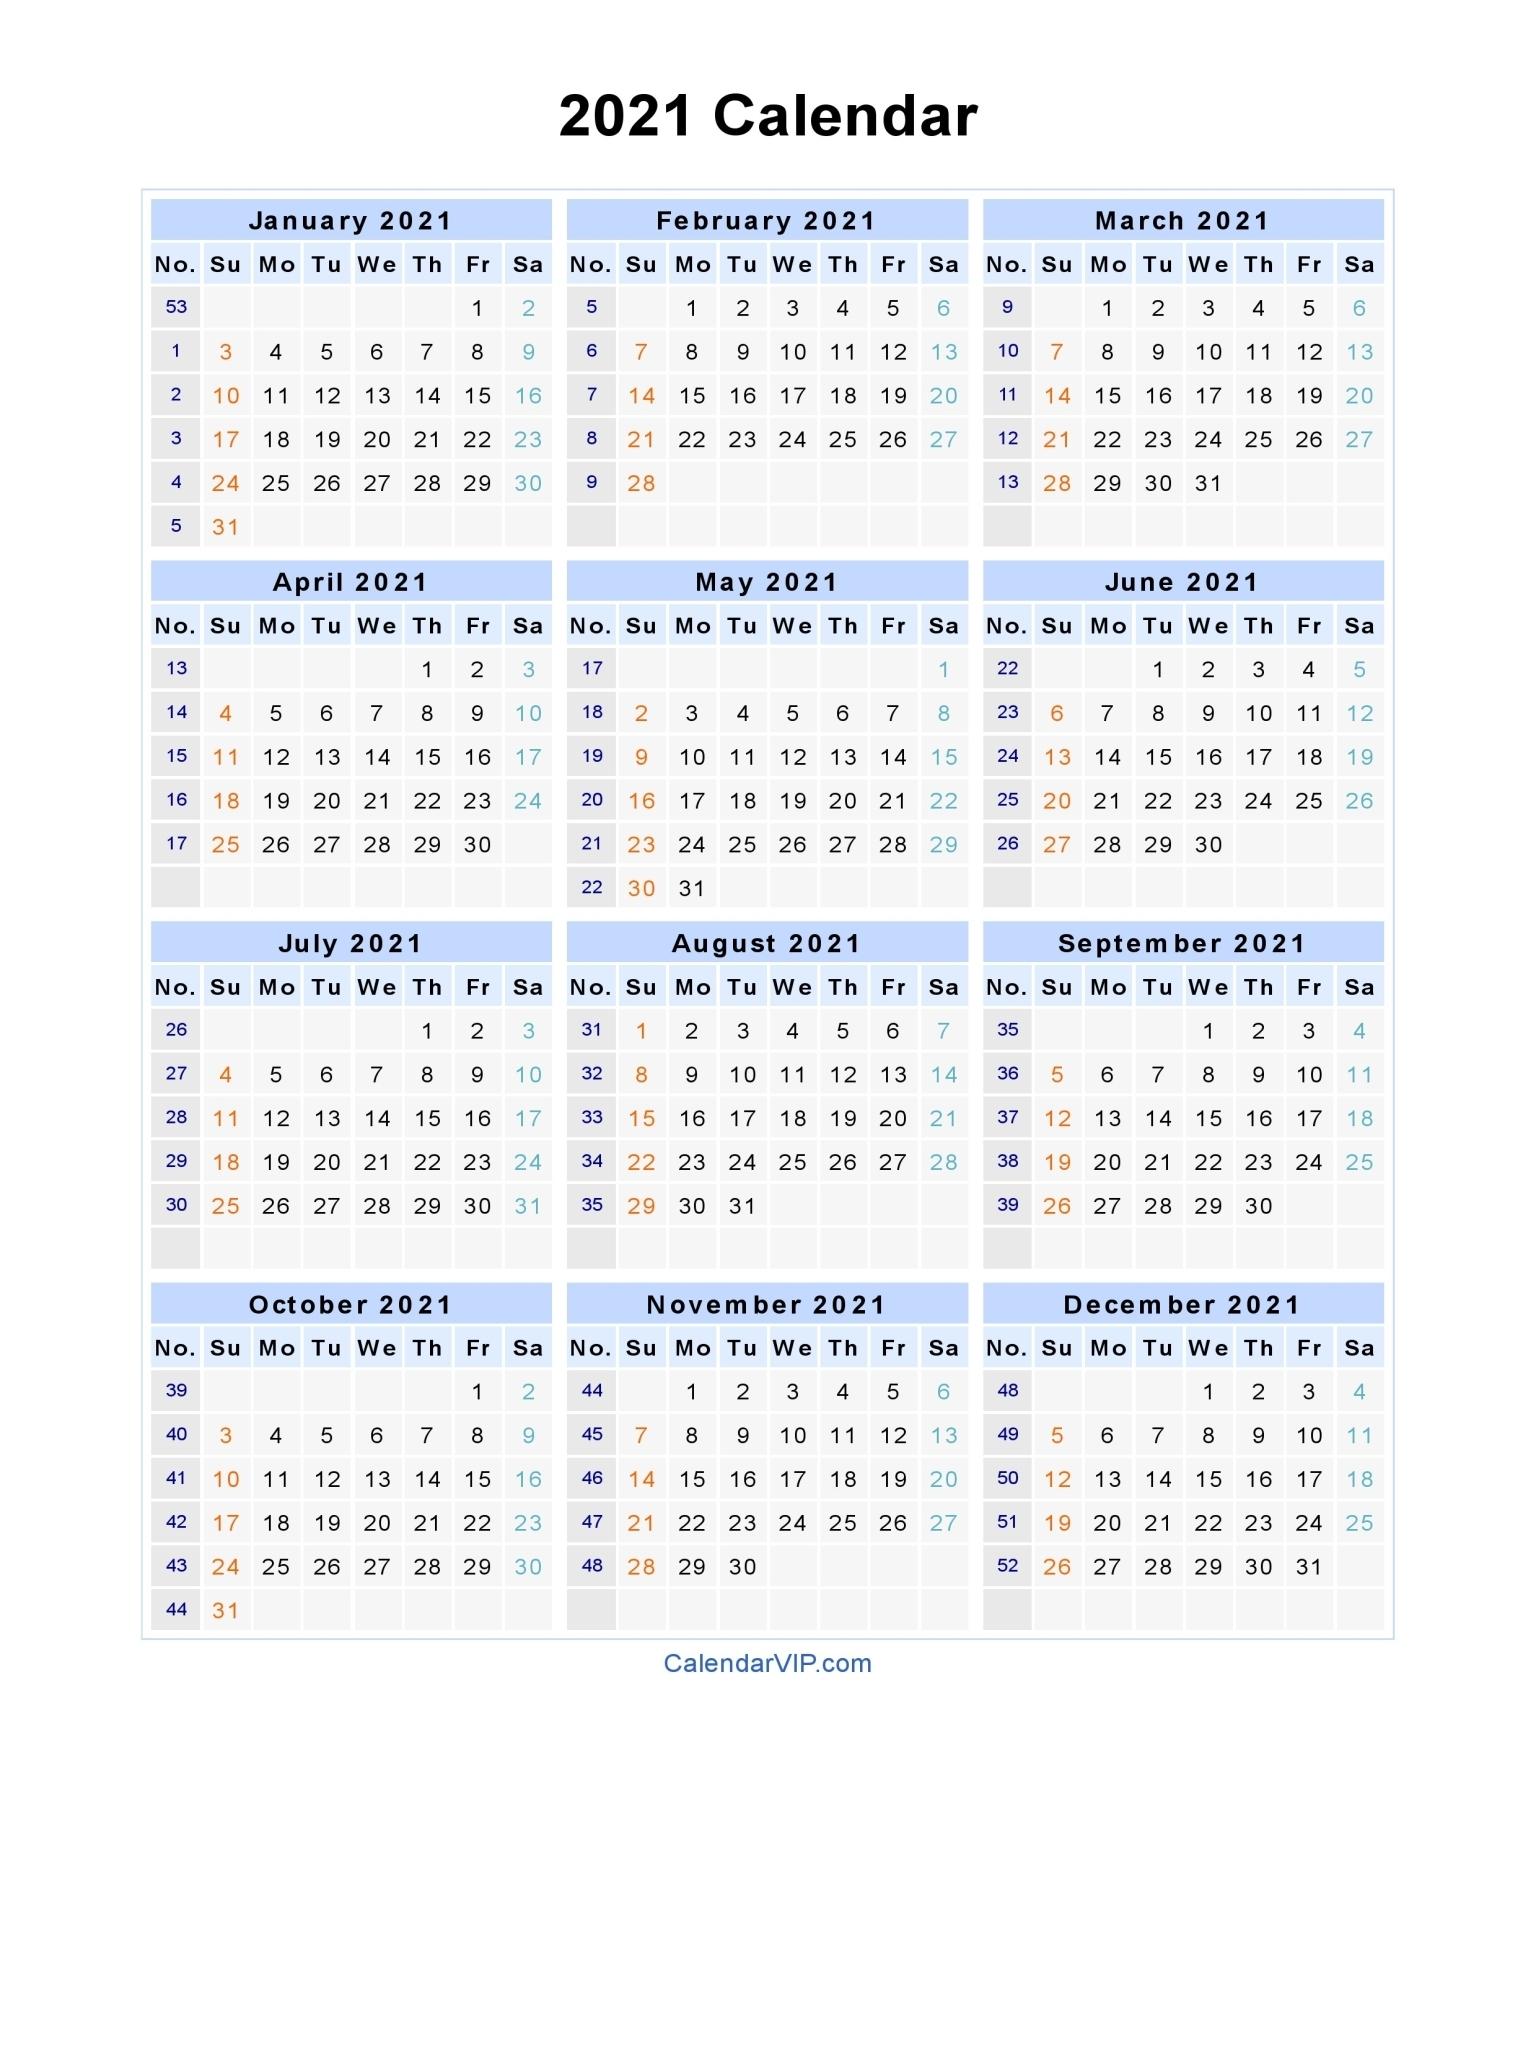 Free Printable Calendar Year 2021 | Ten Free Printable Calendar 2020-2021